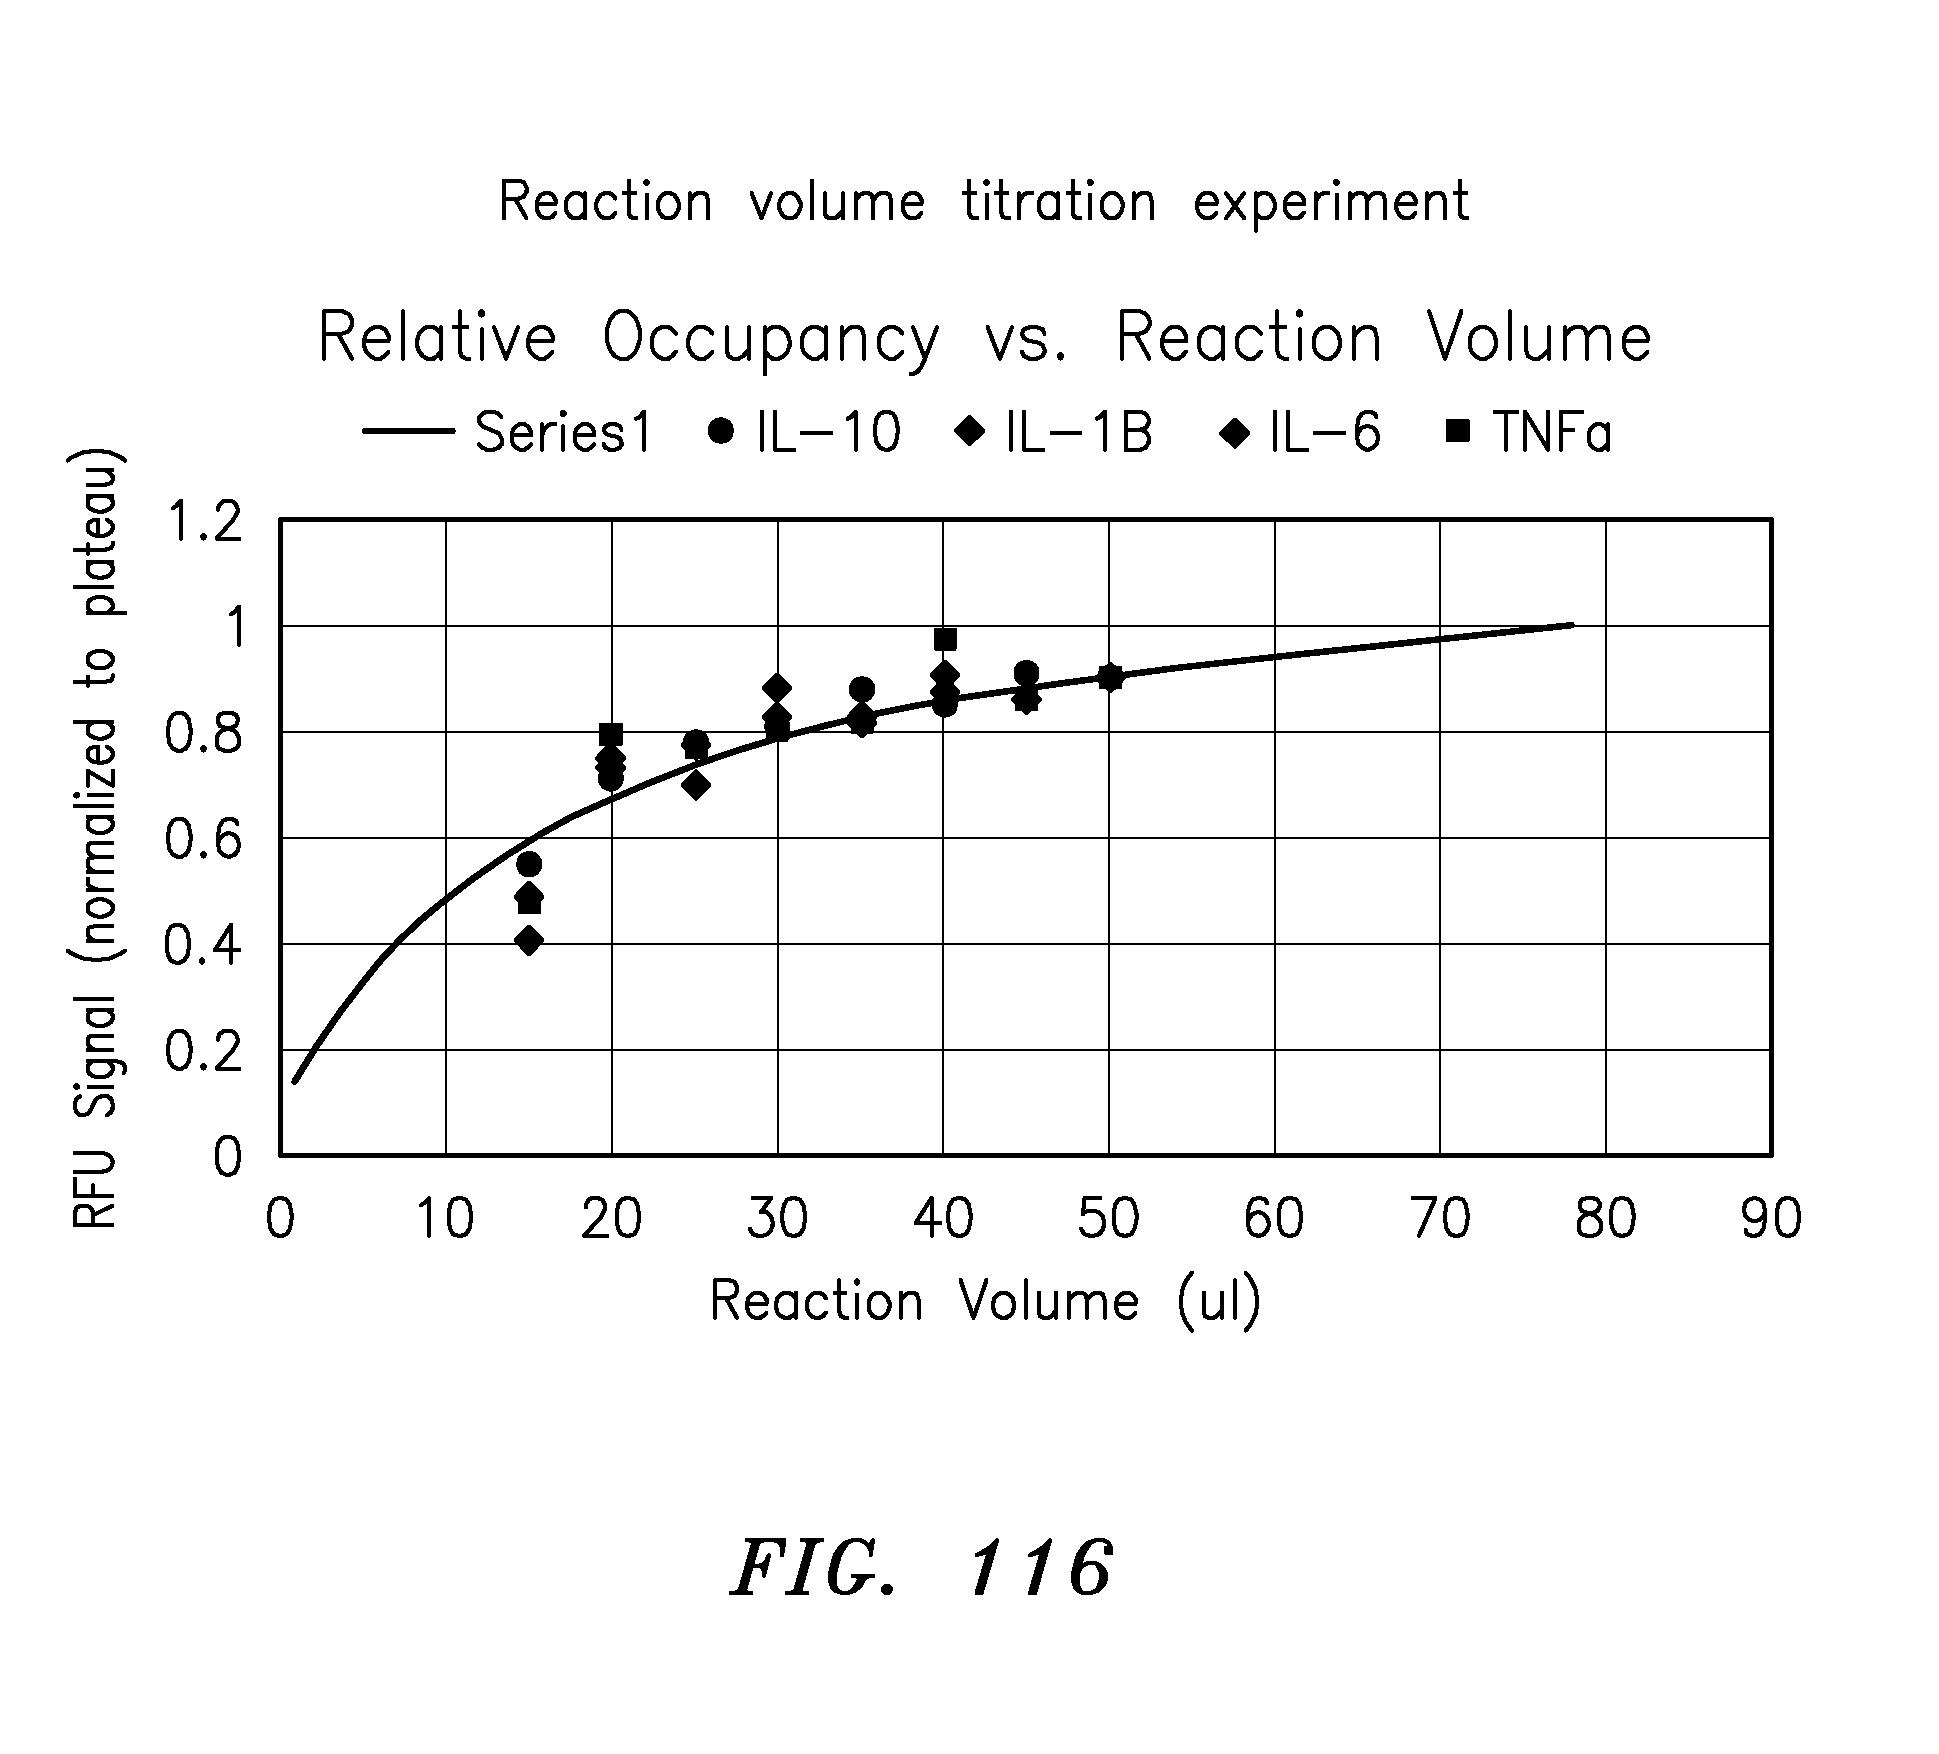 Patent US 9,500,645 B2